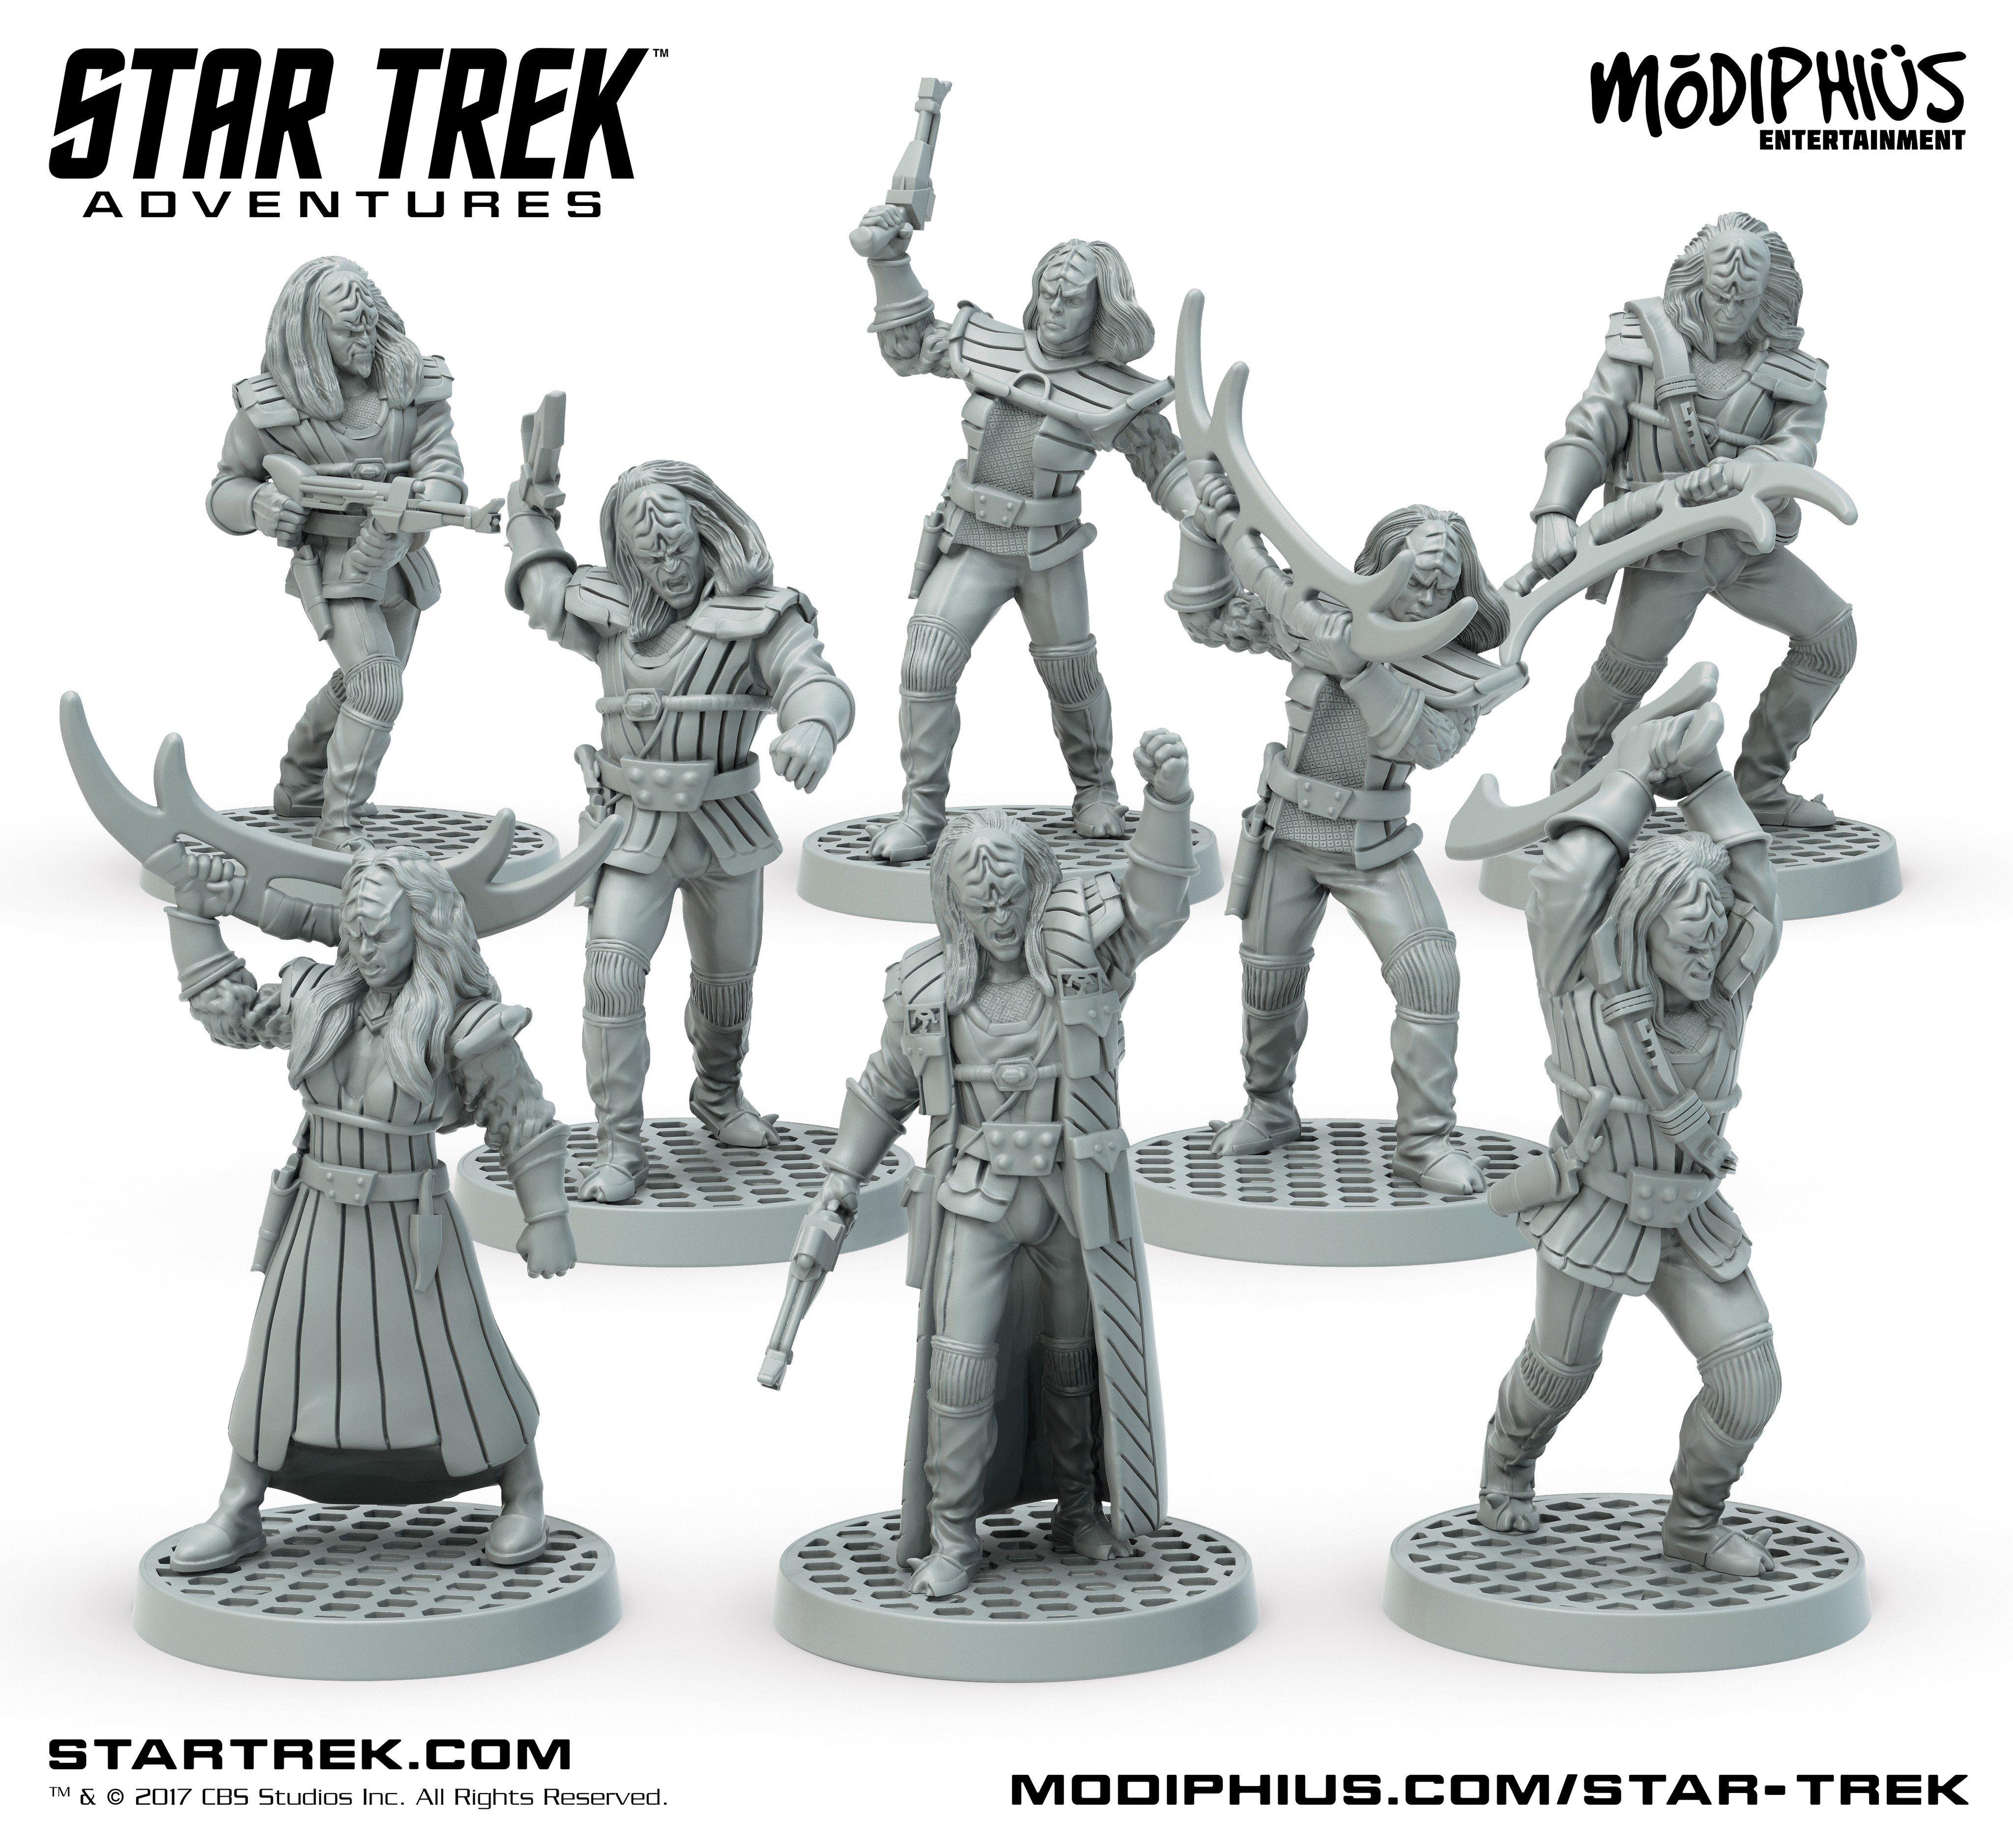 Star Trek Adventures Rpg: Klingon Warband Team Minis Box Set Box Front